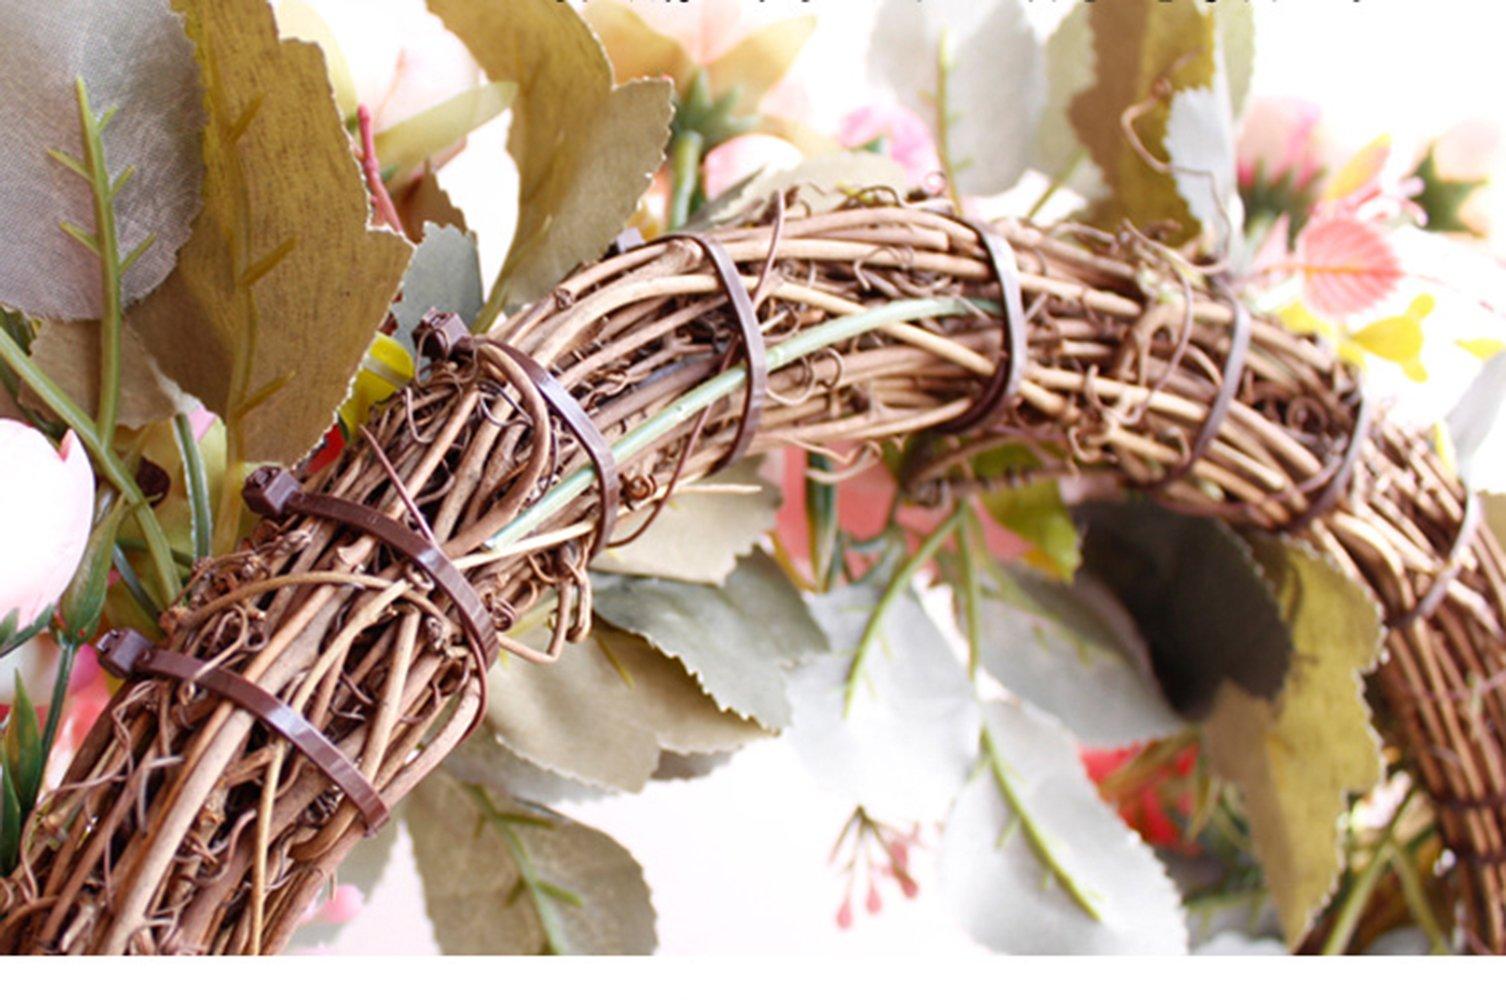 Yokoke-Peony-Wreath-Rose-Floral-Twig-Wreath-16-Inch-Handmade-Vintage-Artificial-Flowers-Garland-Front-Door-Wreath-Beautiful-Silk-For-Spring-And-Summer-Wreath-Display